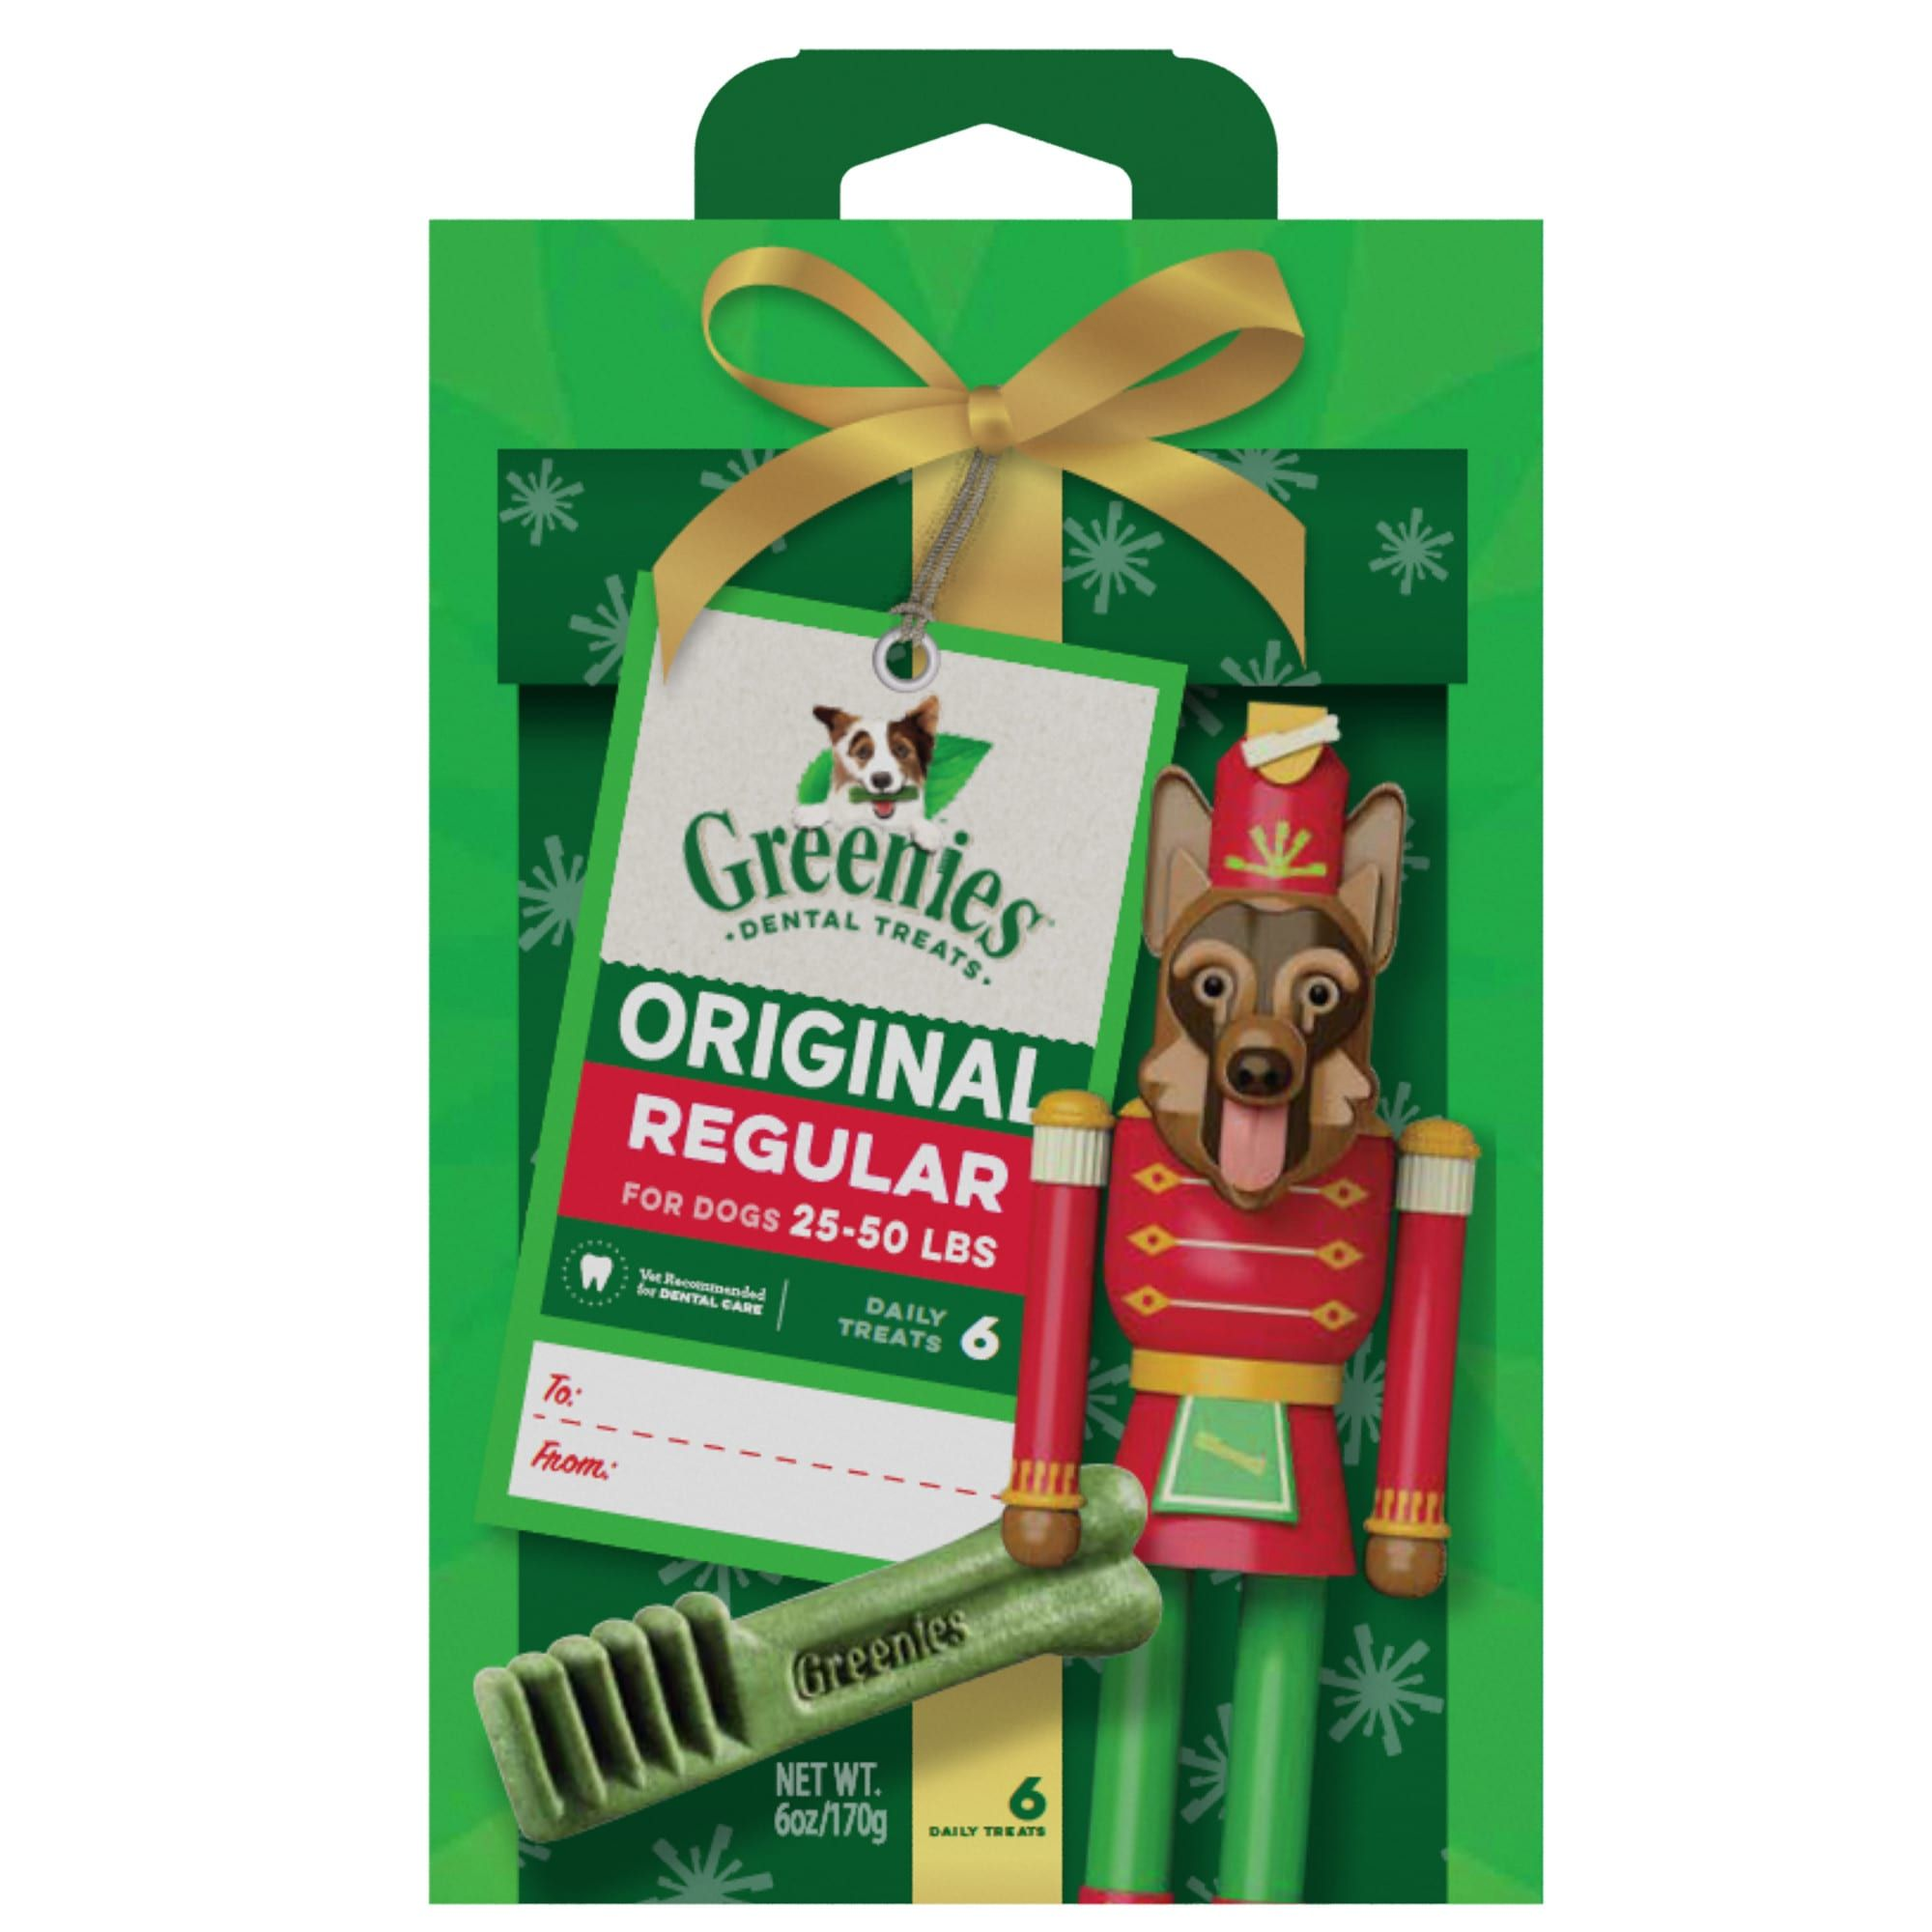 Greenies Original Regular Nutcracker Natural Holiday Dental Dog Chew 6 Oz Petco Holiday Dog Treats Dog Chews Greenies Dog Treats